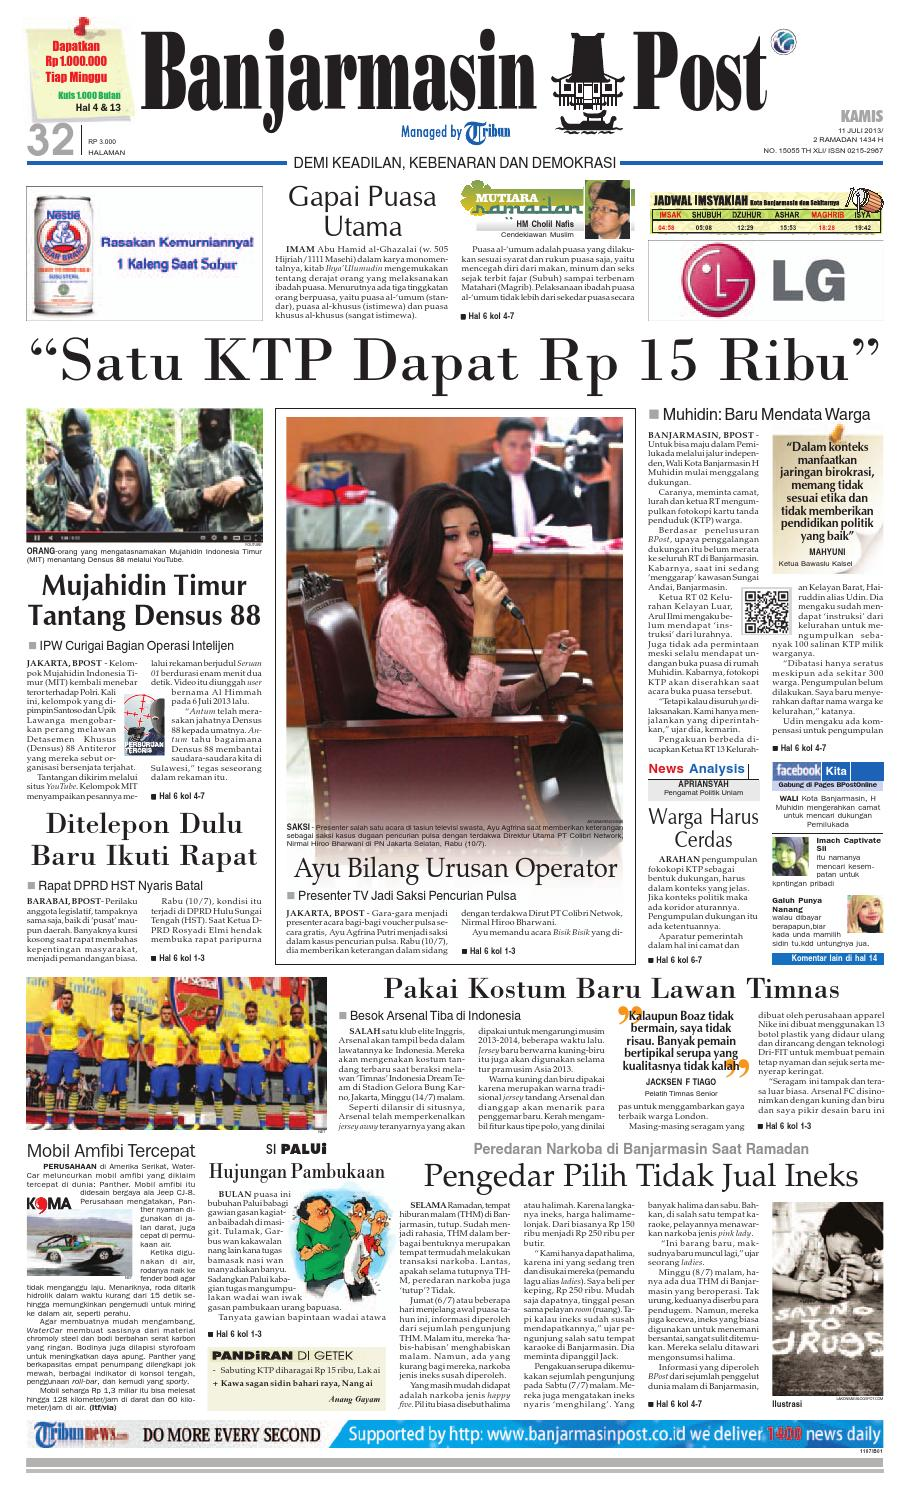 Banjarmasin Post Kamis 11 Juli 2013 By Banjarmasin Post Issuu